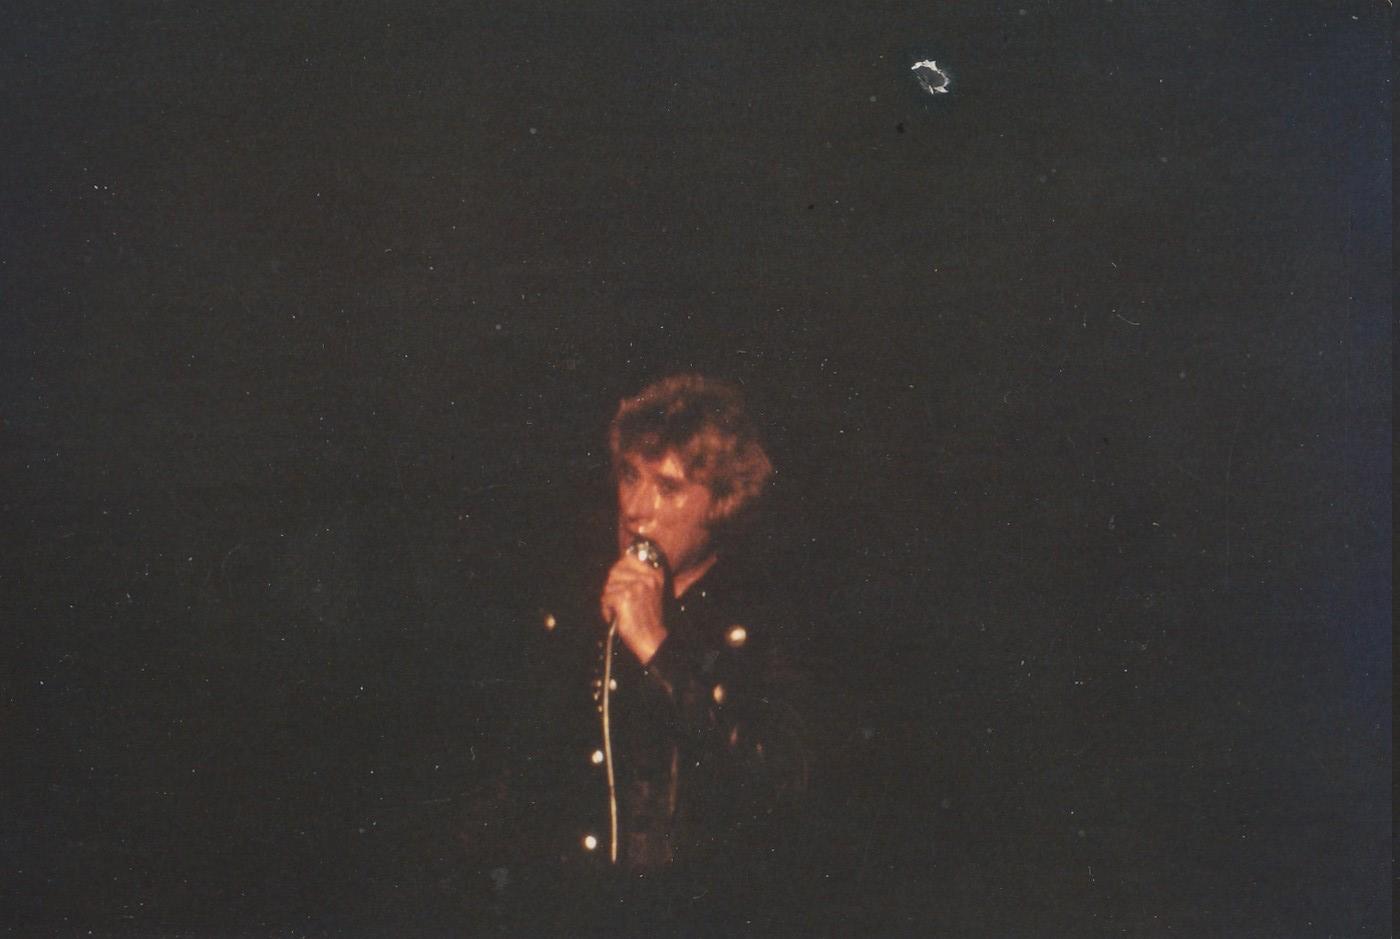 INÉDIT  :  JOHNNY HALLYDAY EN TOURNEE - HIVER 1978 -1979 ( PHOTOS INÉDITES )   Img_2640